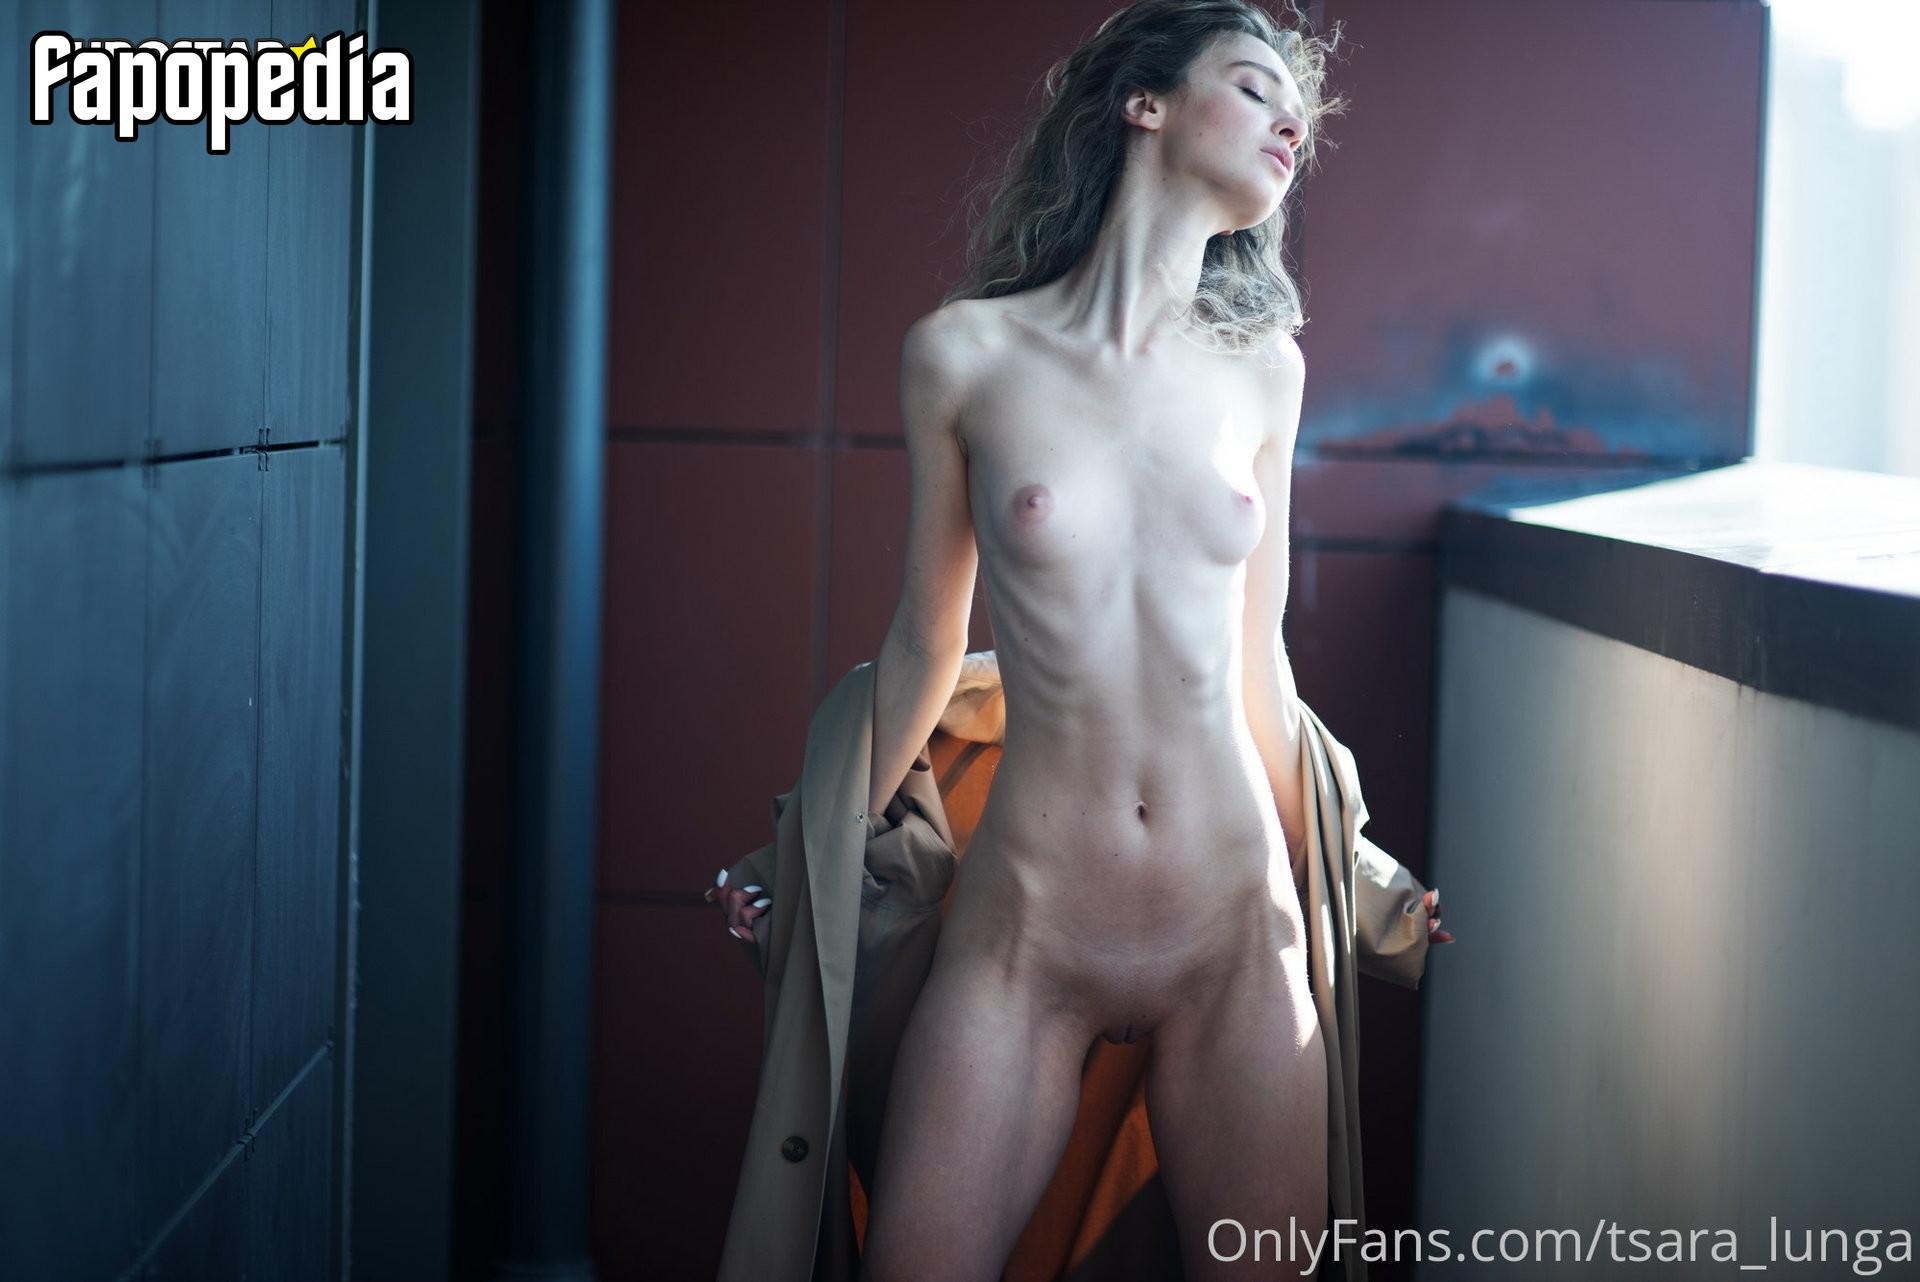 Tsara_lunga Nude OnlyFans Leaks